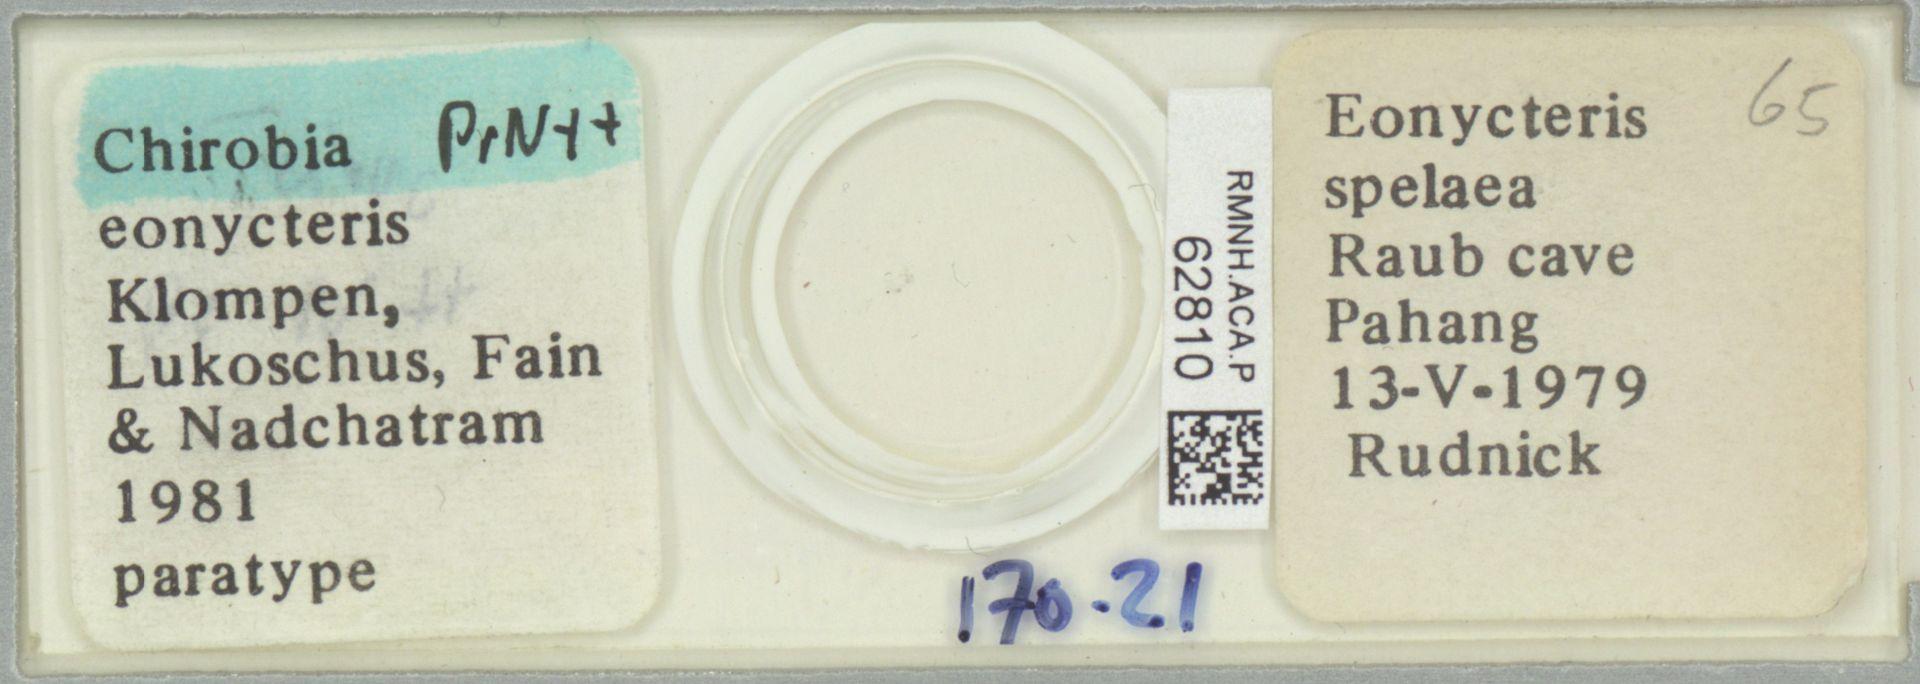 RMNH.ACA.P.62810 | Chirobia eonycteris Klompen, Lukoschus, Fain & Nadchatram 1981